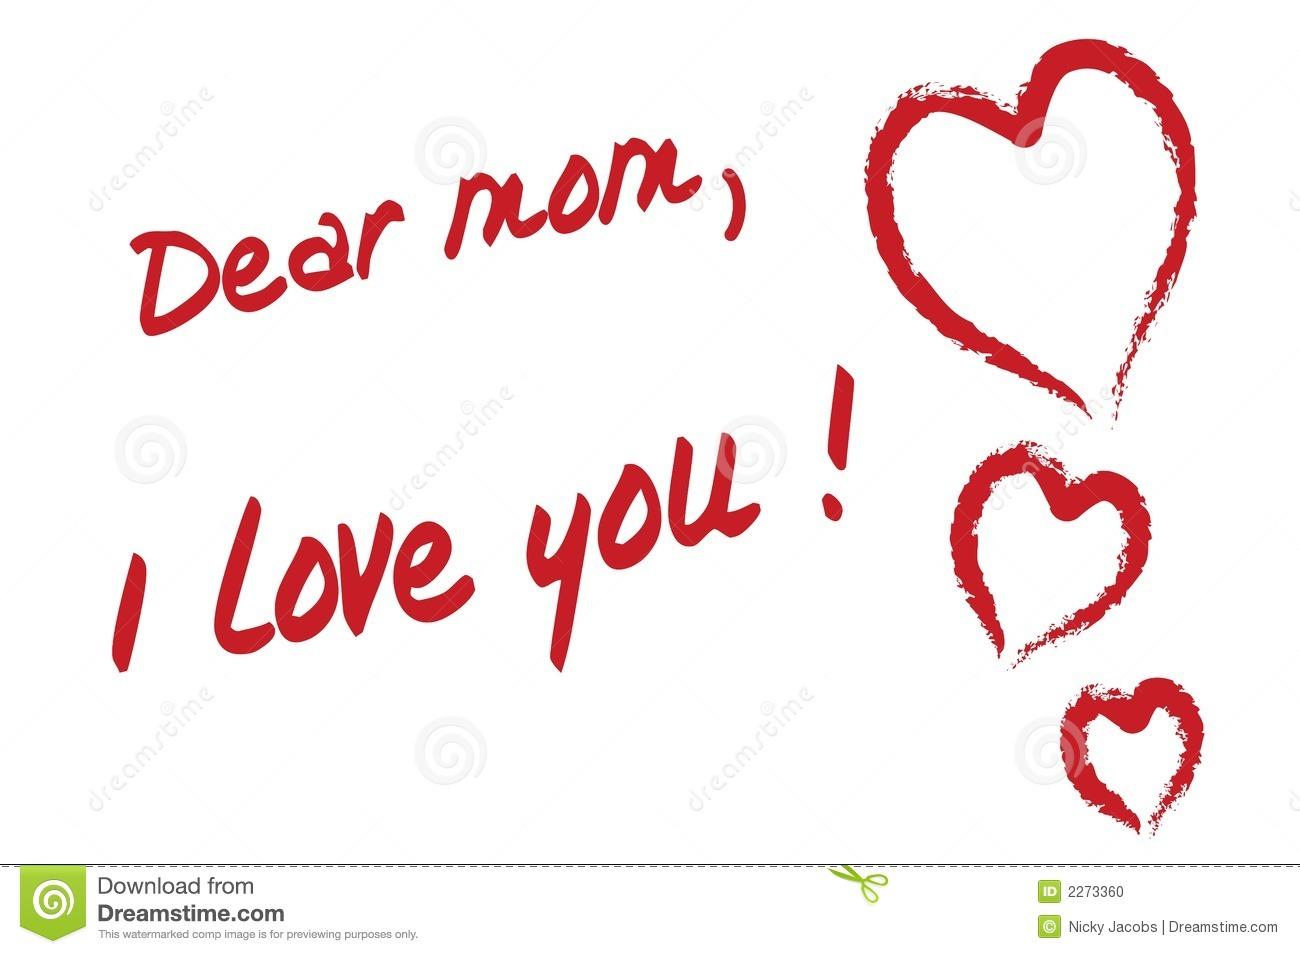 I love u mama clipart clipart black and white Dear Mom I Love You Stock Photo - Image: 2273360 clipart black and white